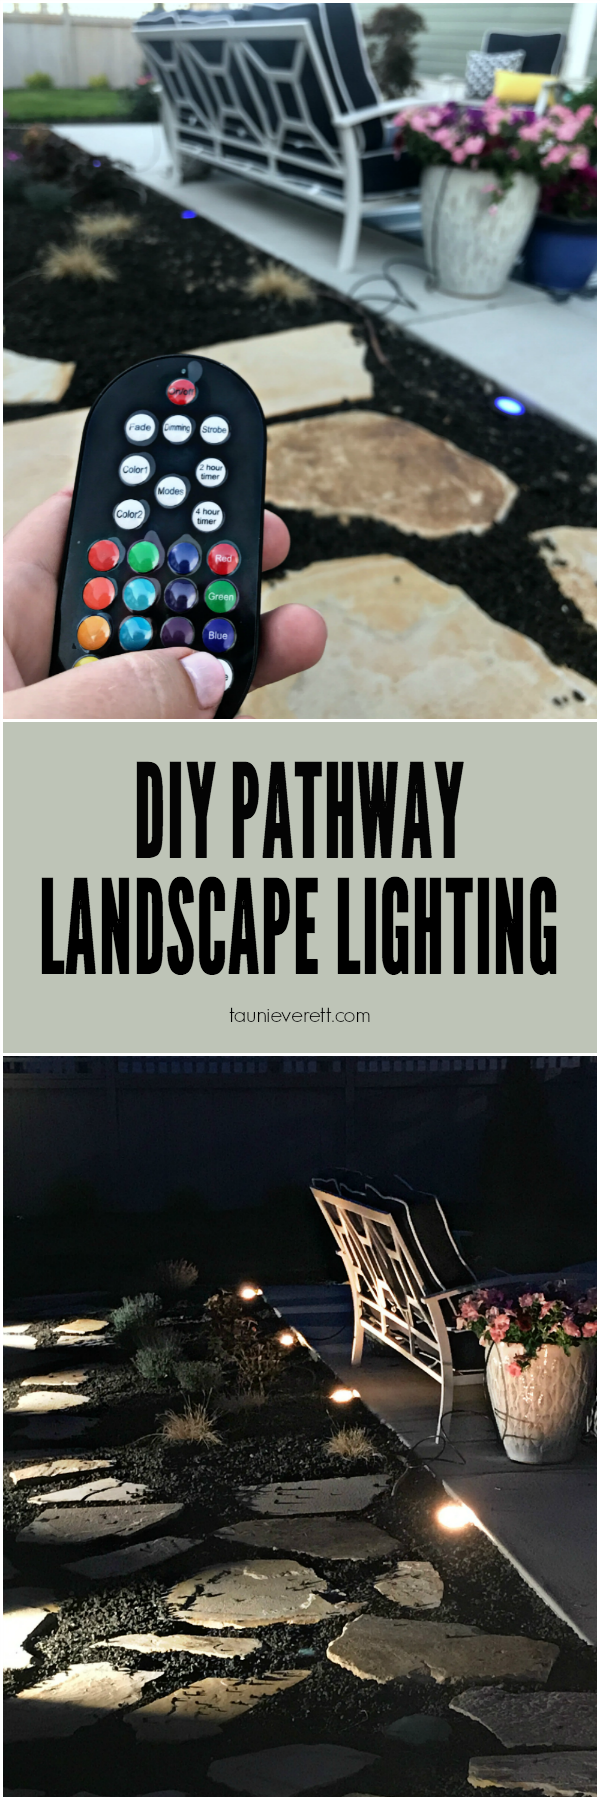 Easy, inexpensive DIY pathway landscape lighting